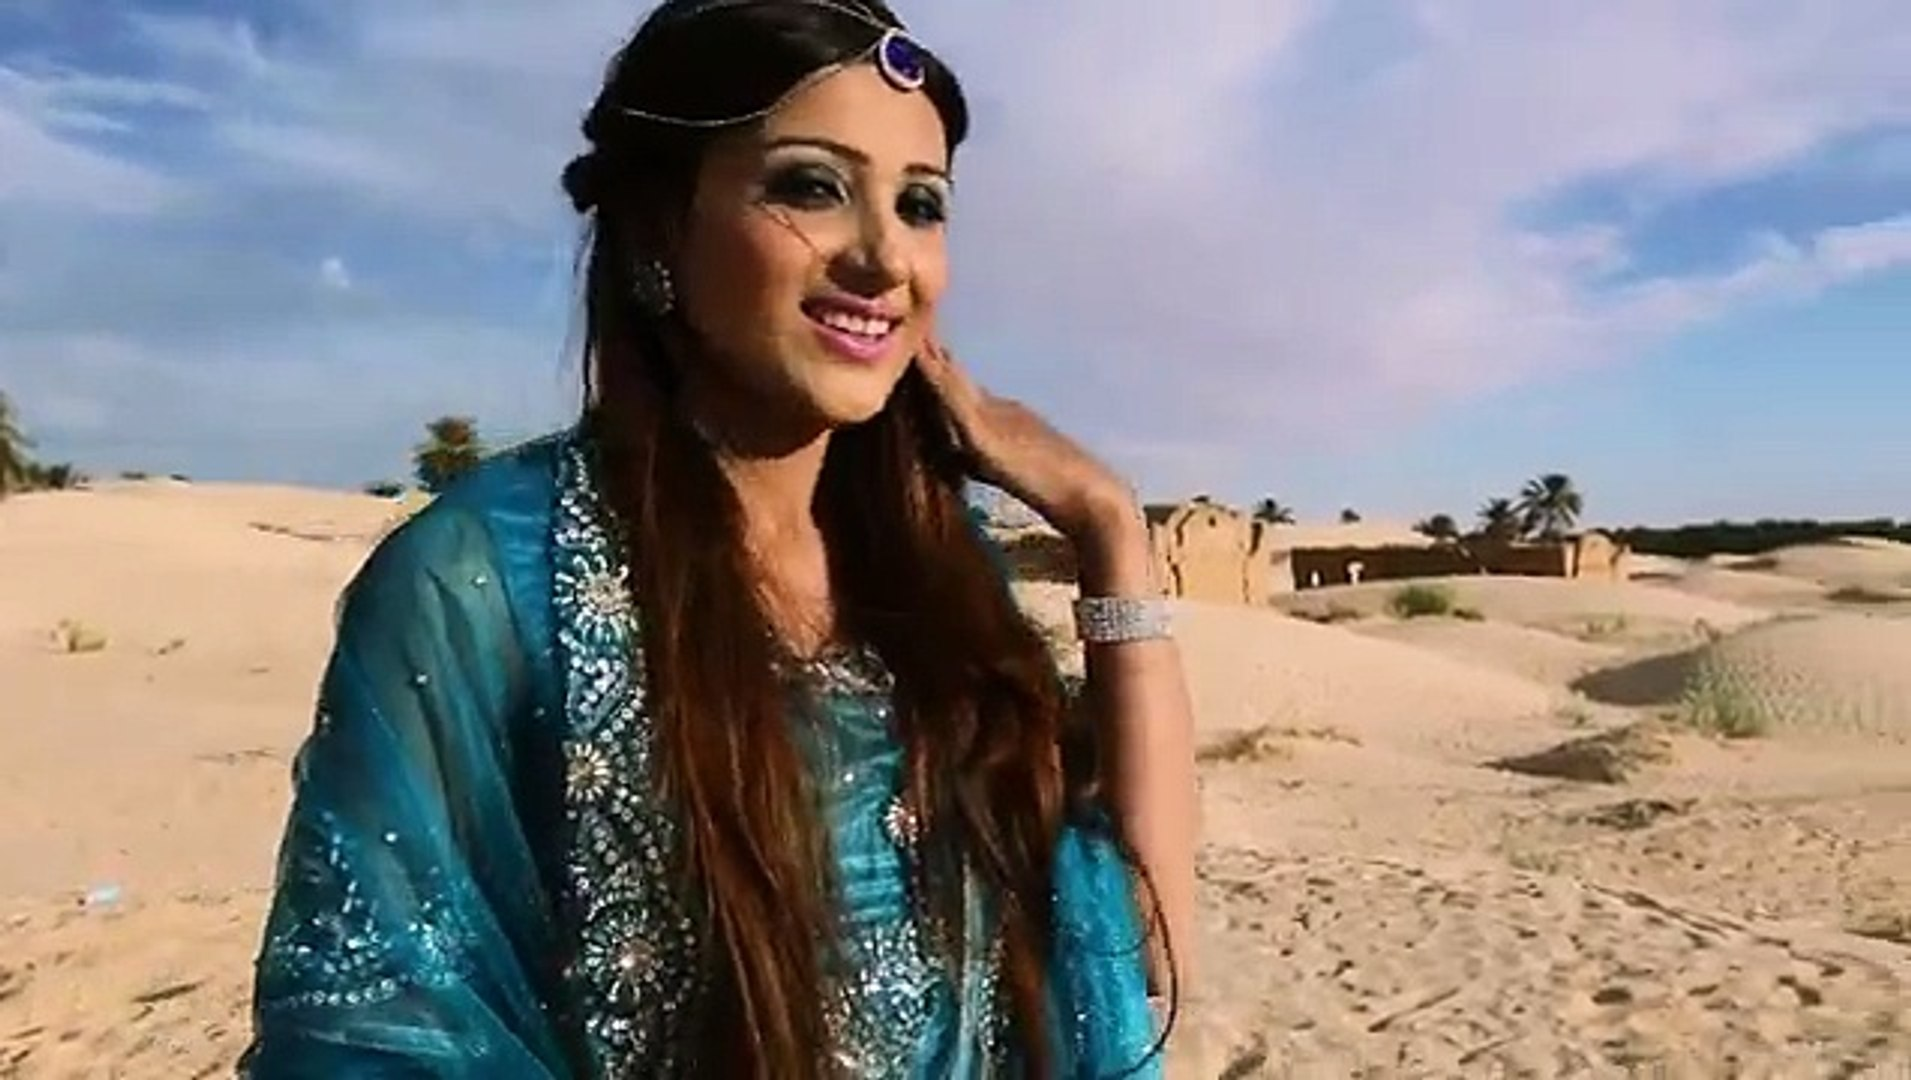 I Love You Baby ✪ Jouiny Feat Laila Khan 2016 HD 720p ✪ - Pashto Tube